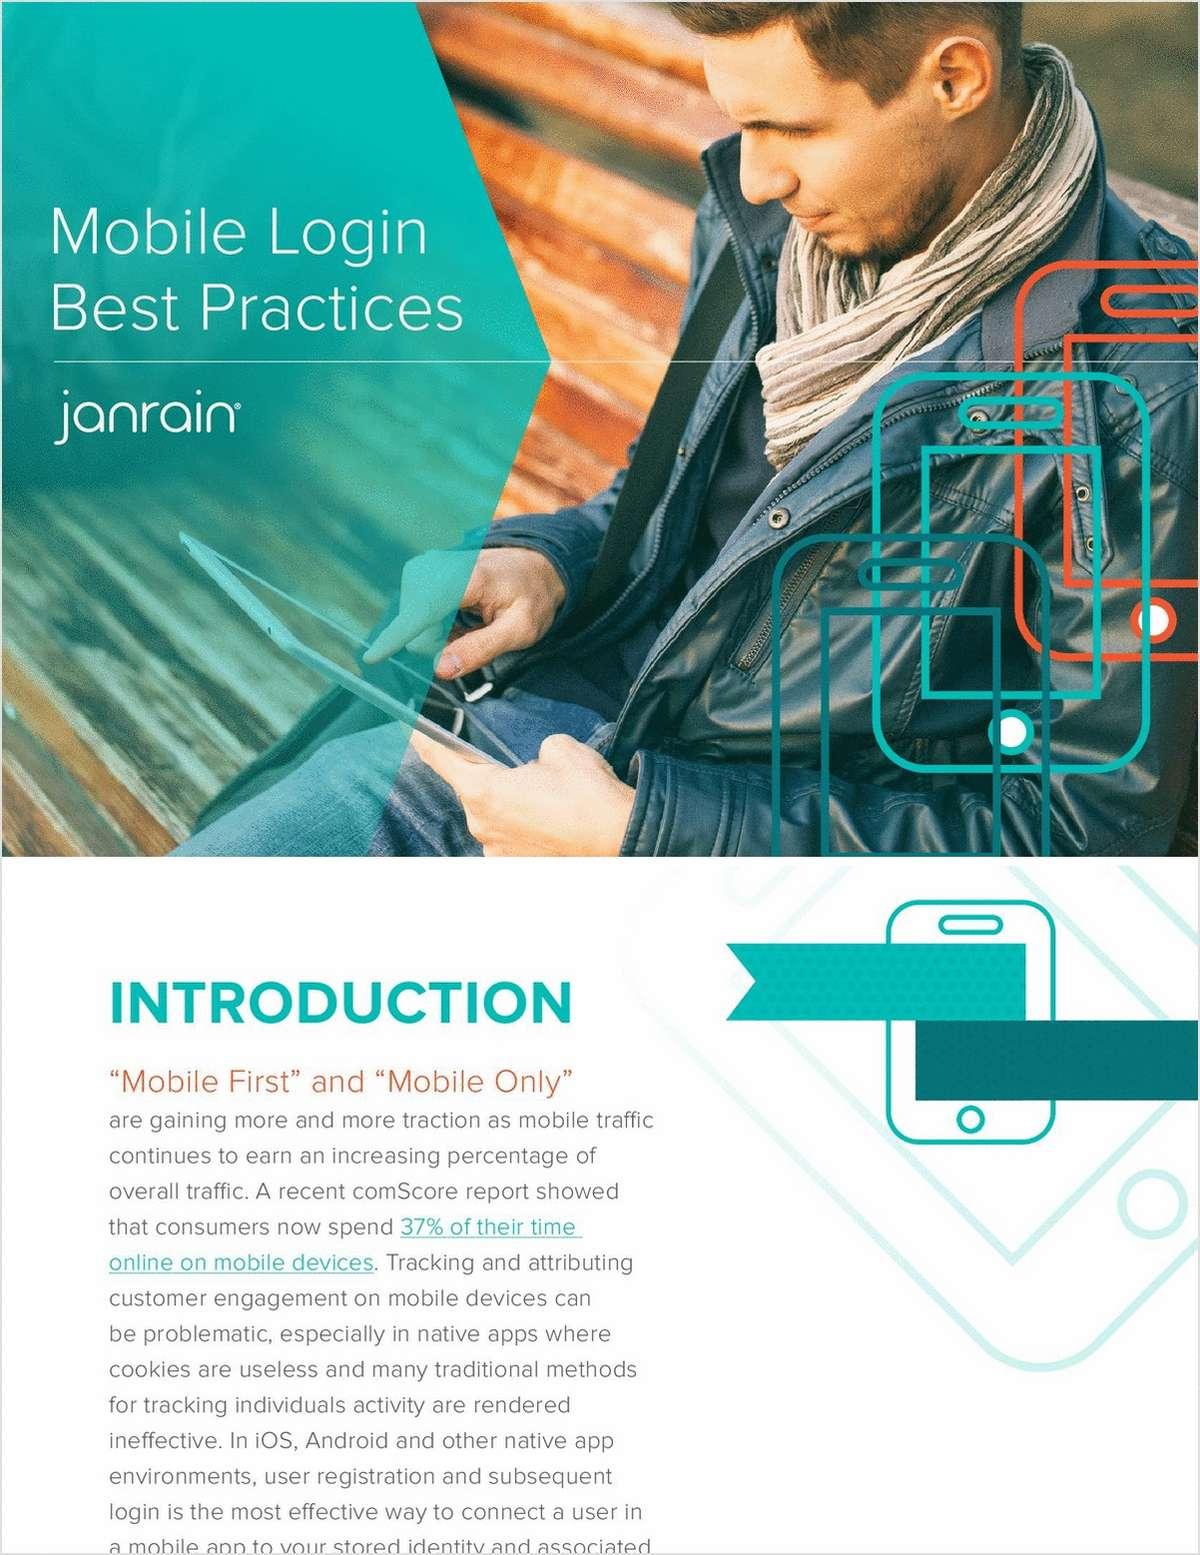 Mobile Login Best Practices